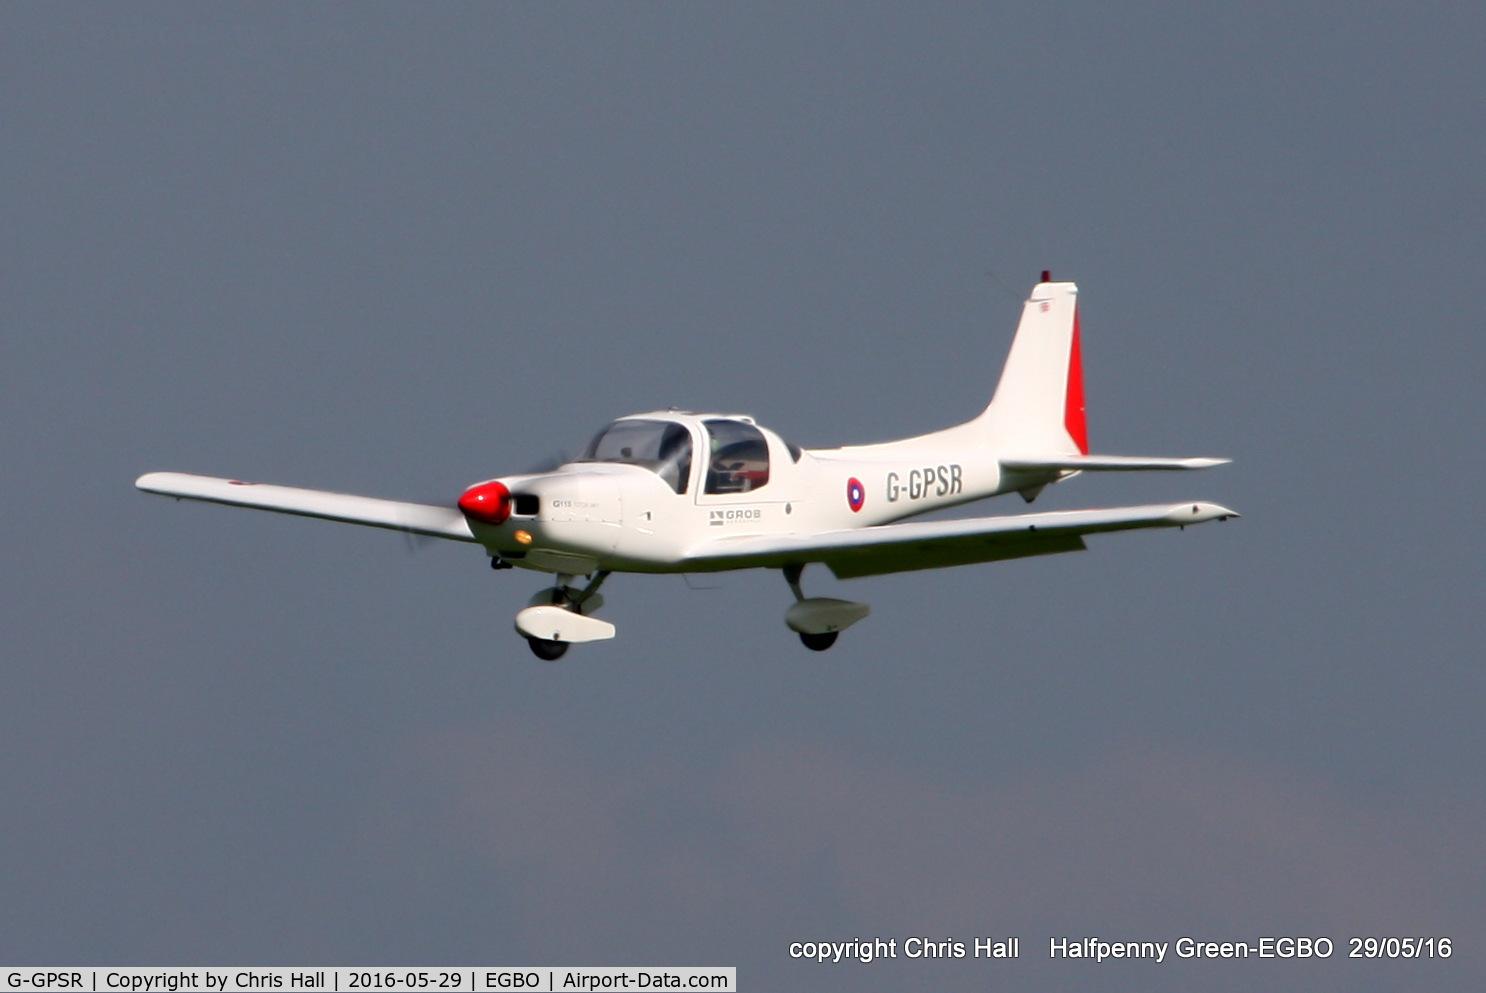 G-GPSR, 1988 Grob G-115 C/N 8024, at Halfpenny Green